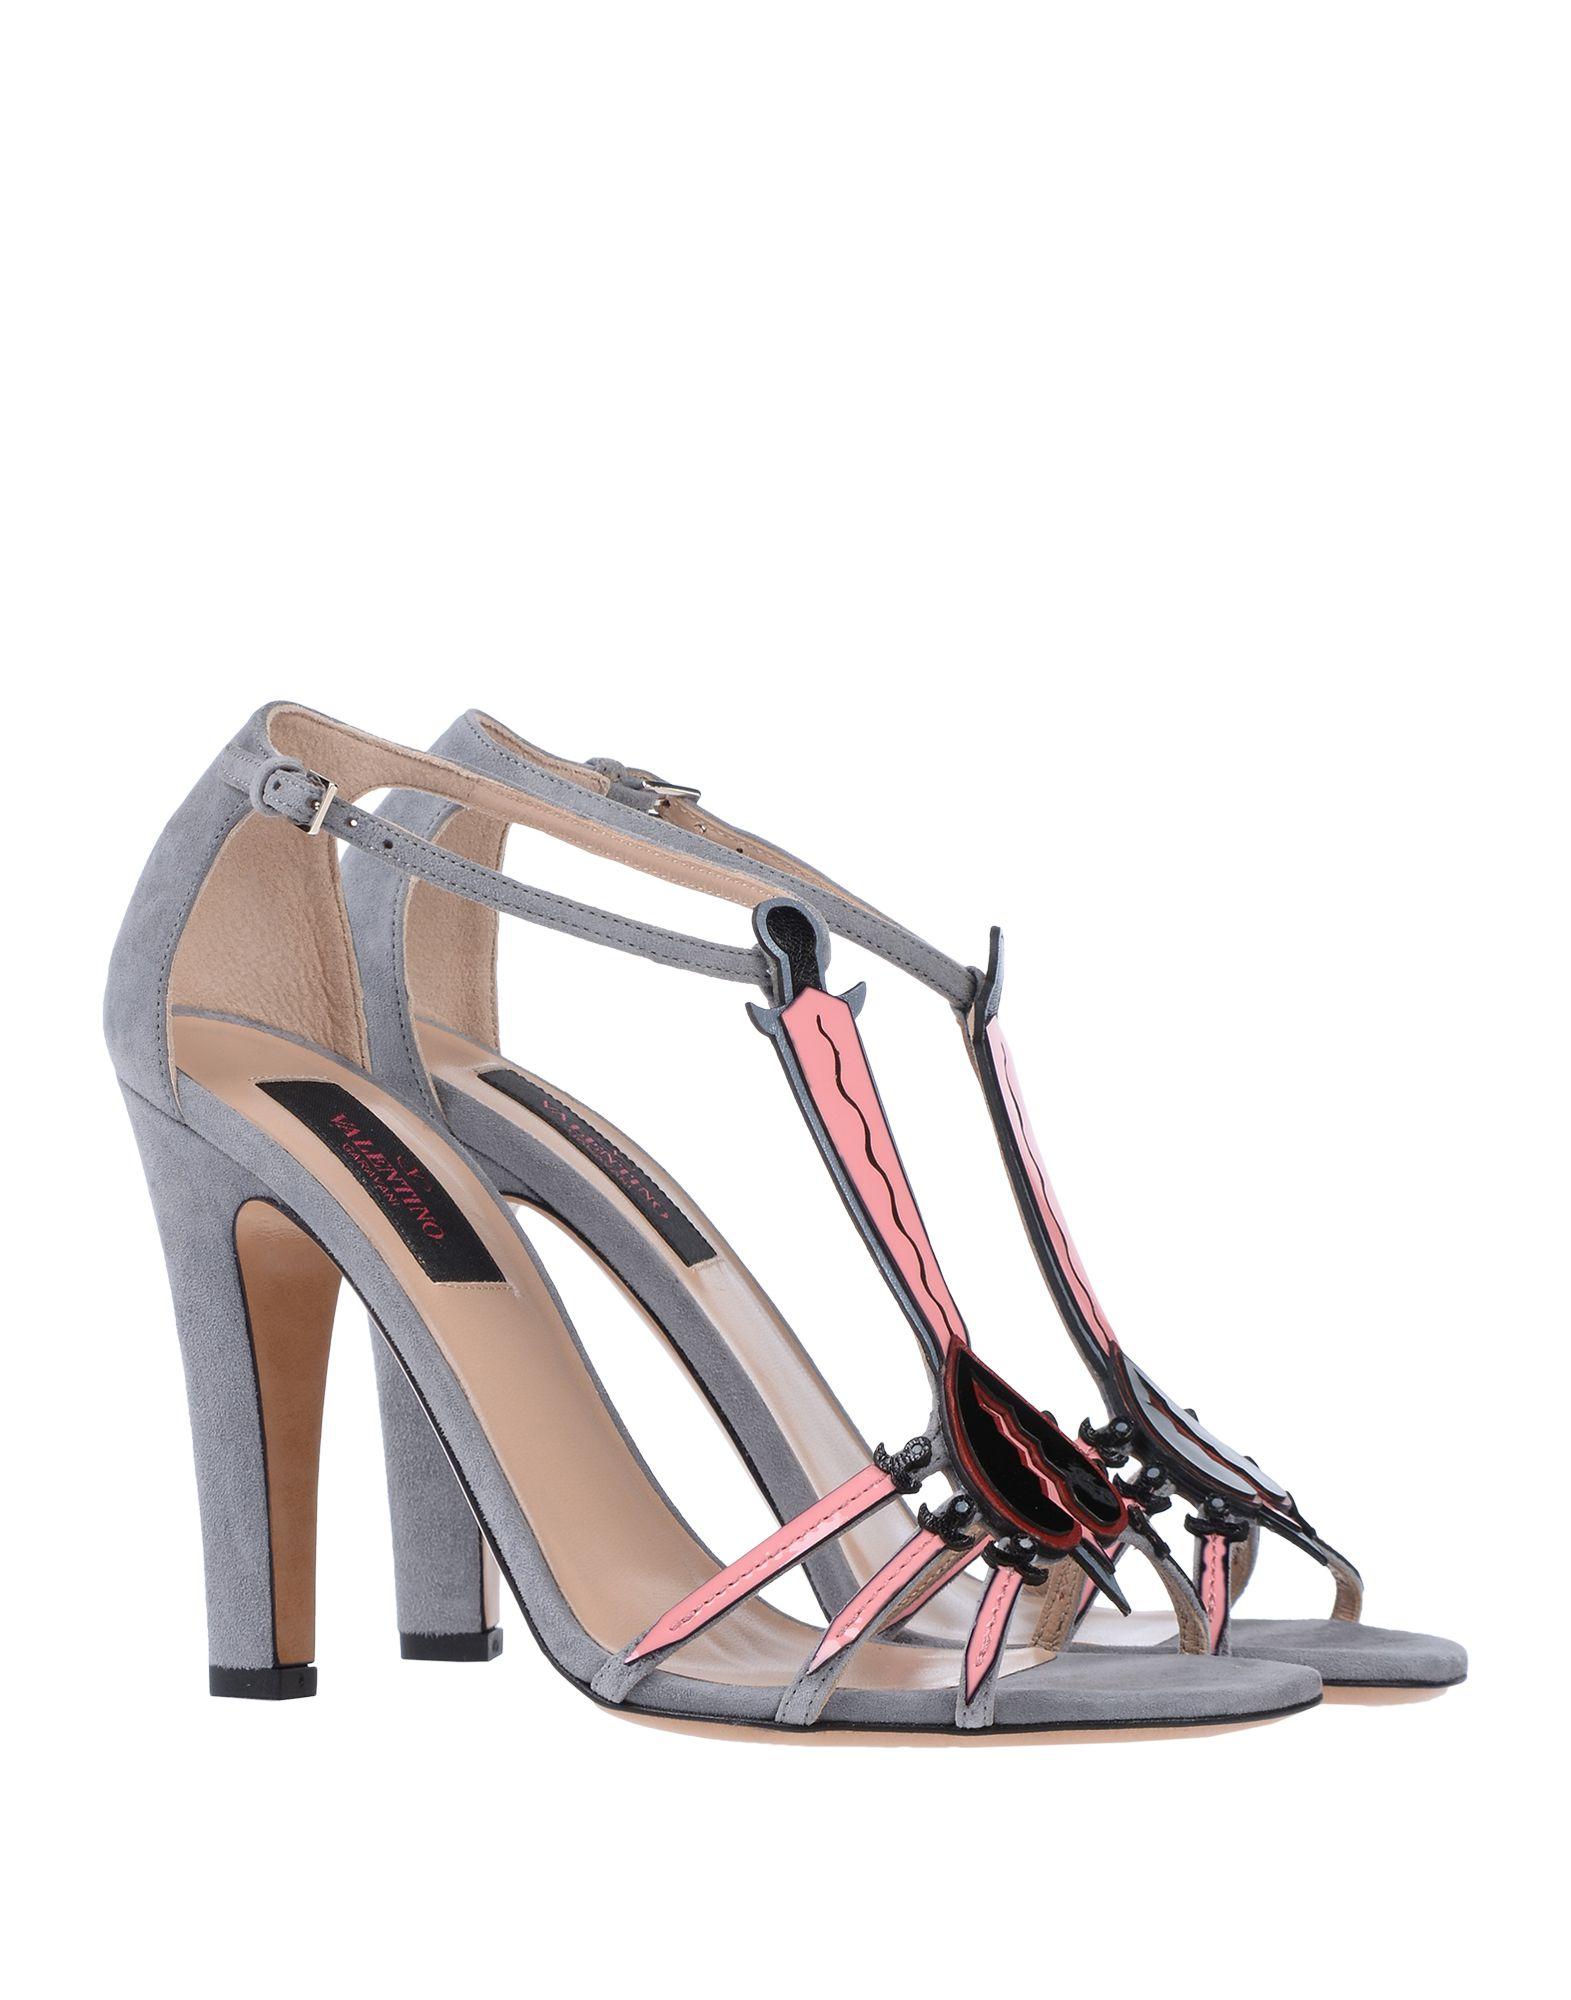 Sandales Valentino Garavani Femme - Sandales Valentino Garavani sur